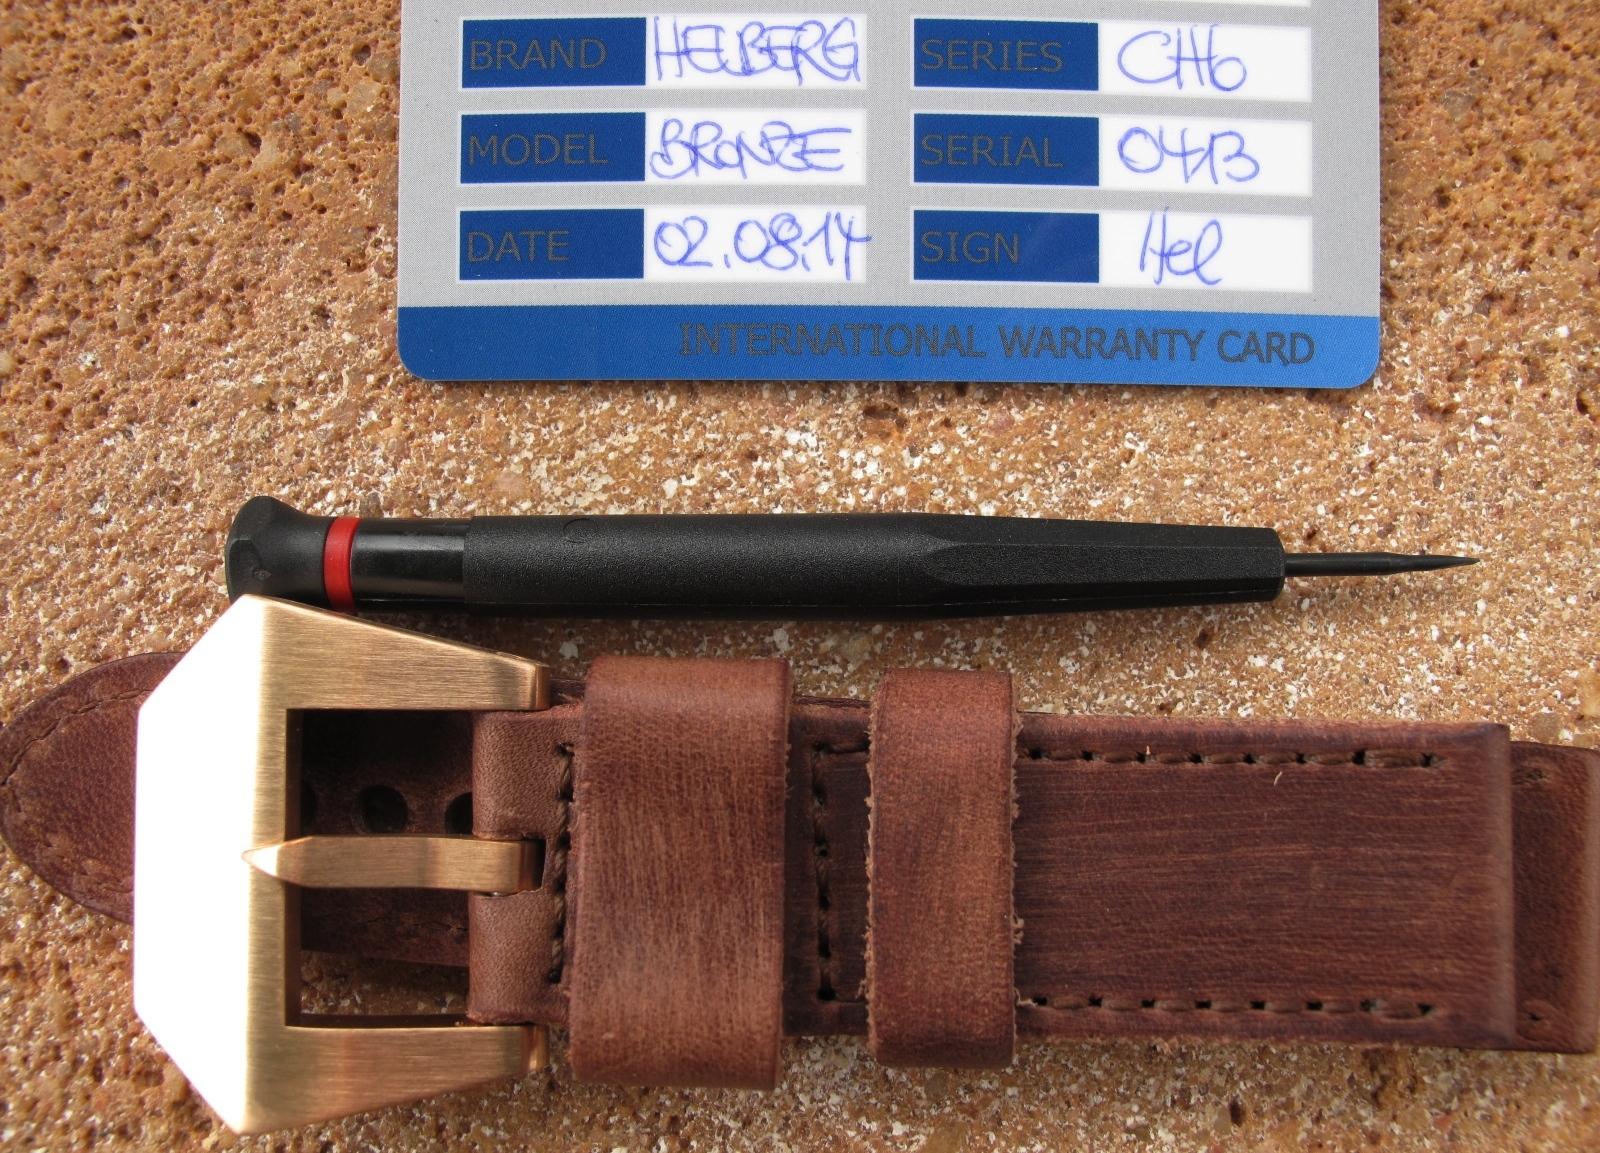 Erledigt] Helberg CH6 Bronze - Braunes Blatt, Bronze-Lünette ...